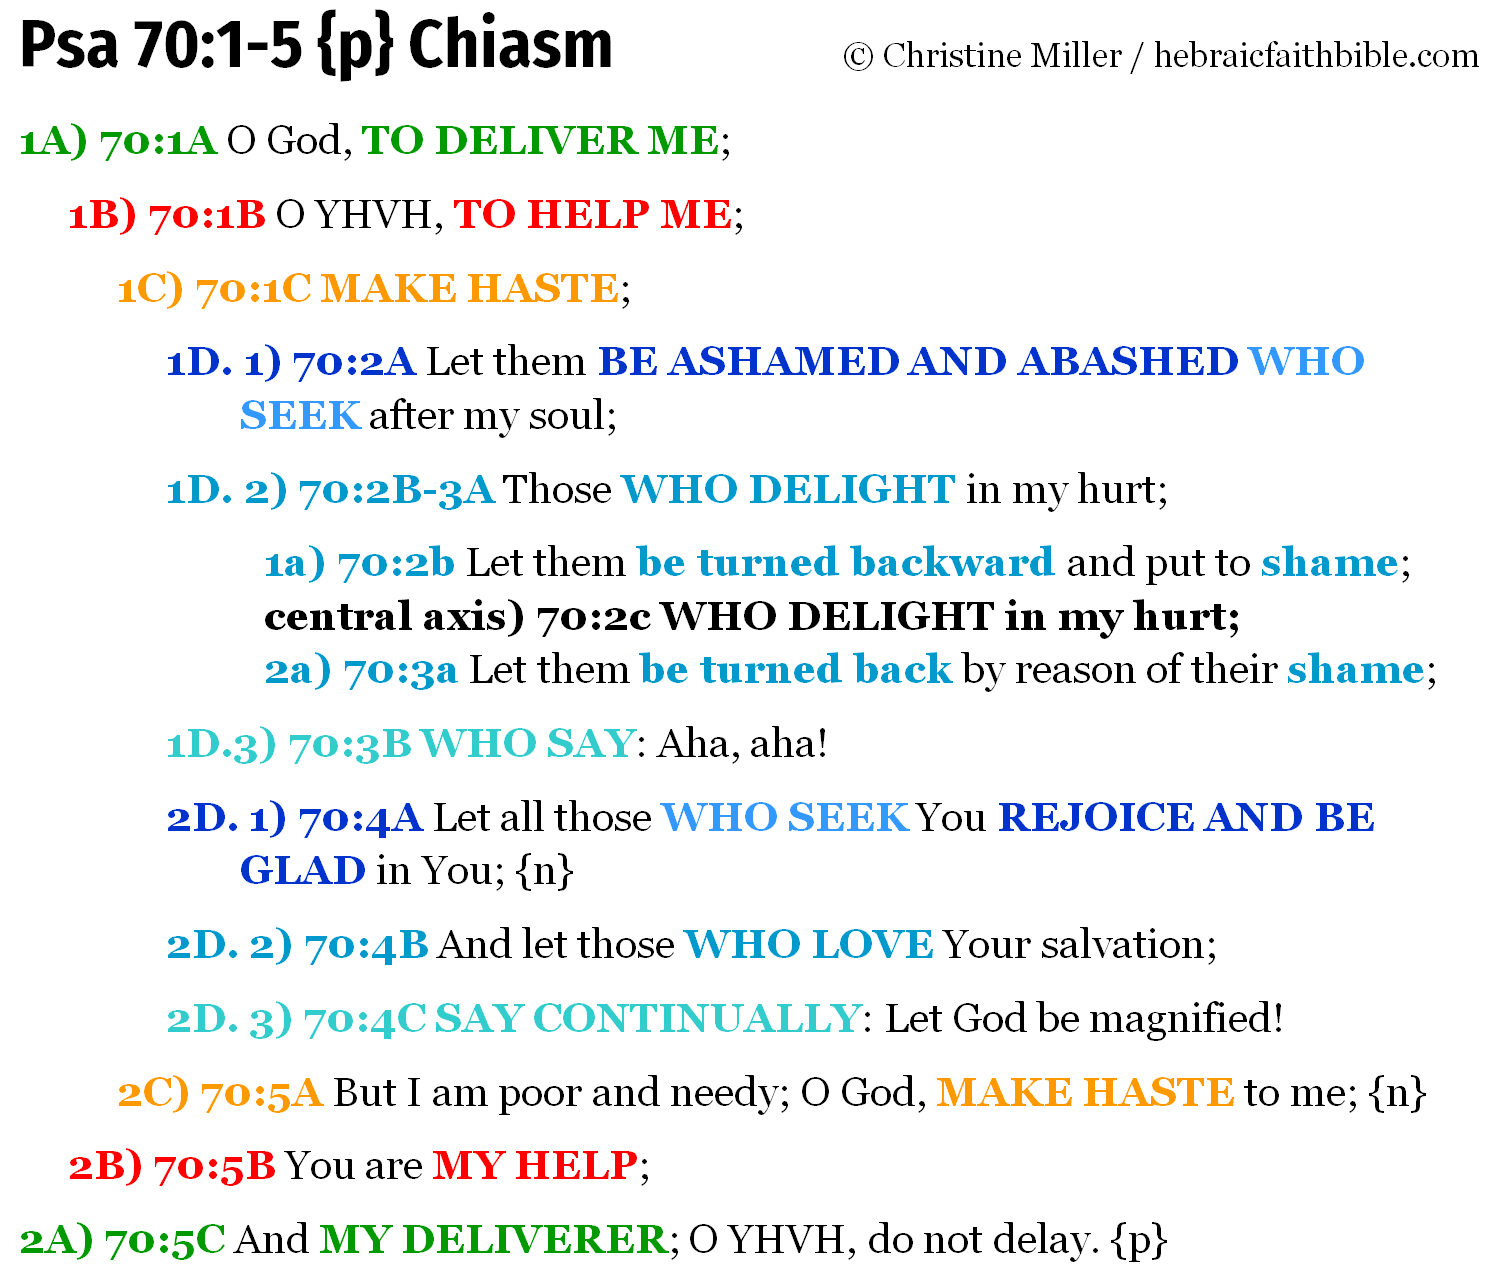 Psa 70:1-5 chiasm | hebraicfaithbible.com